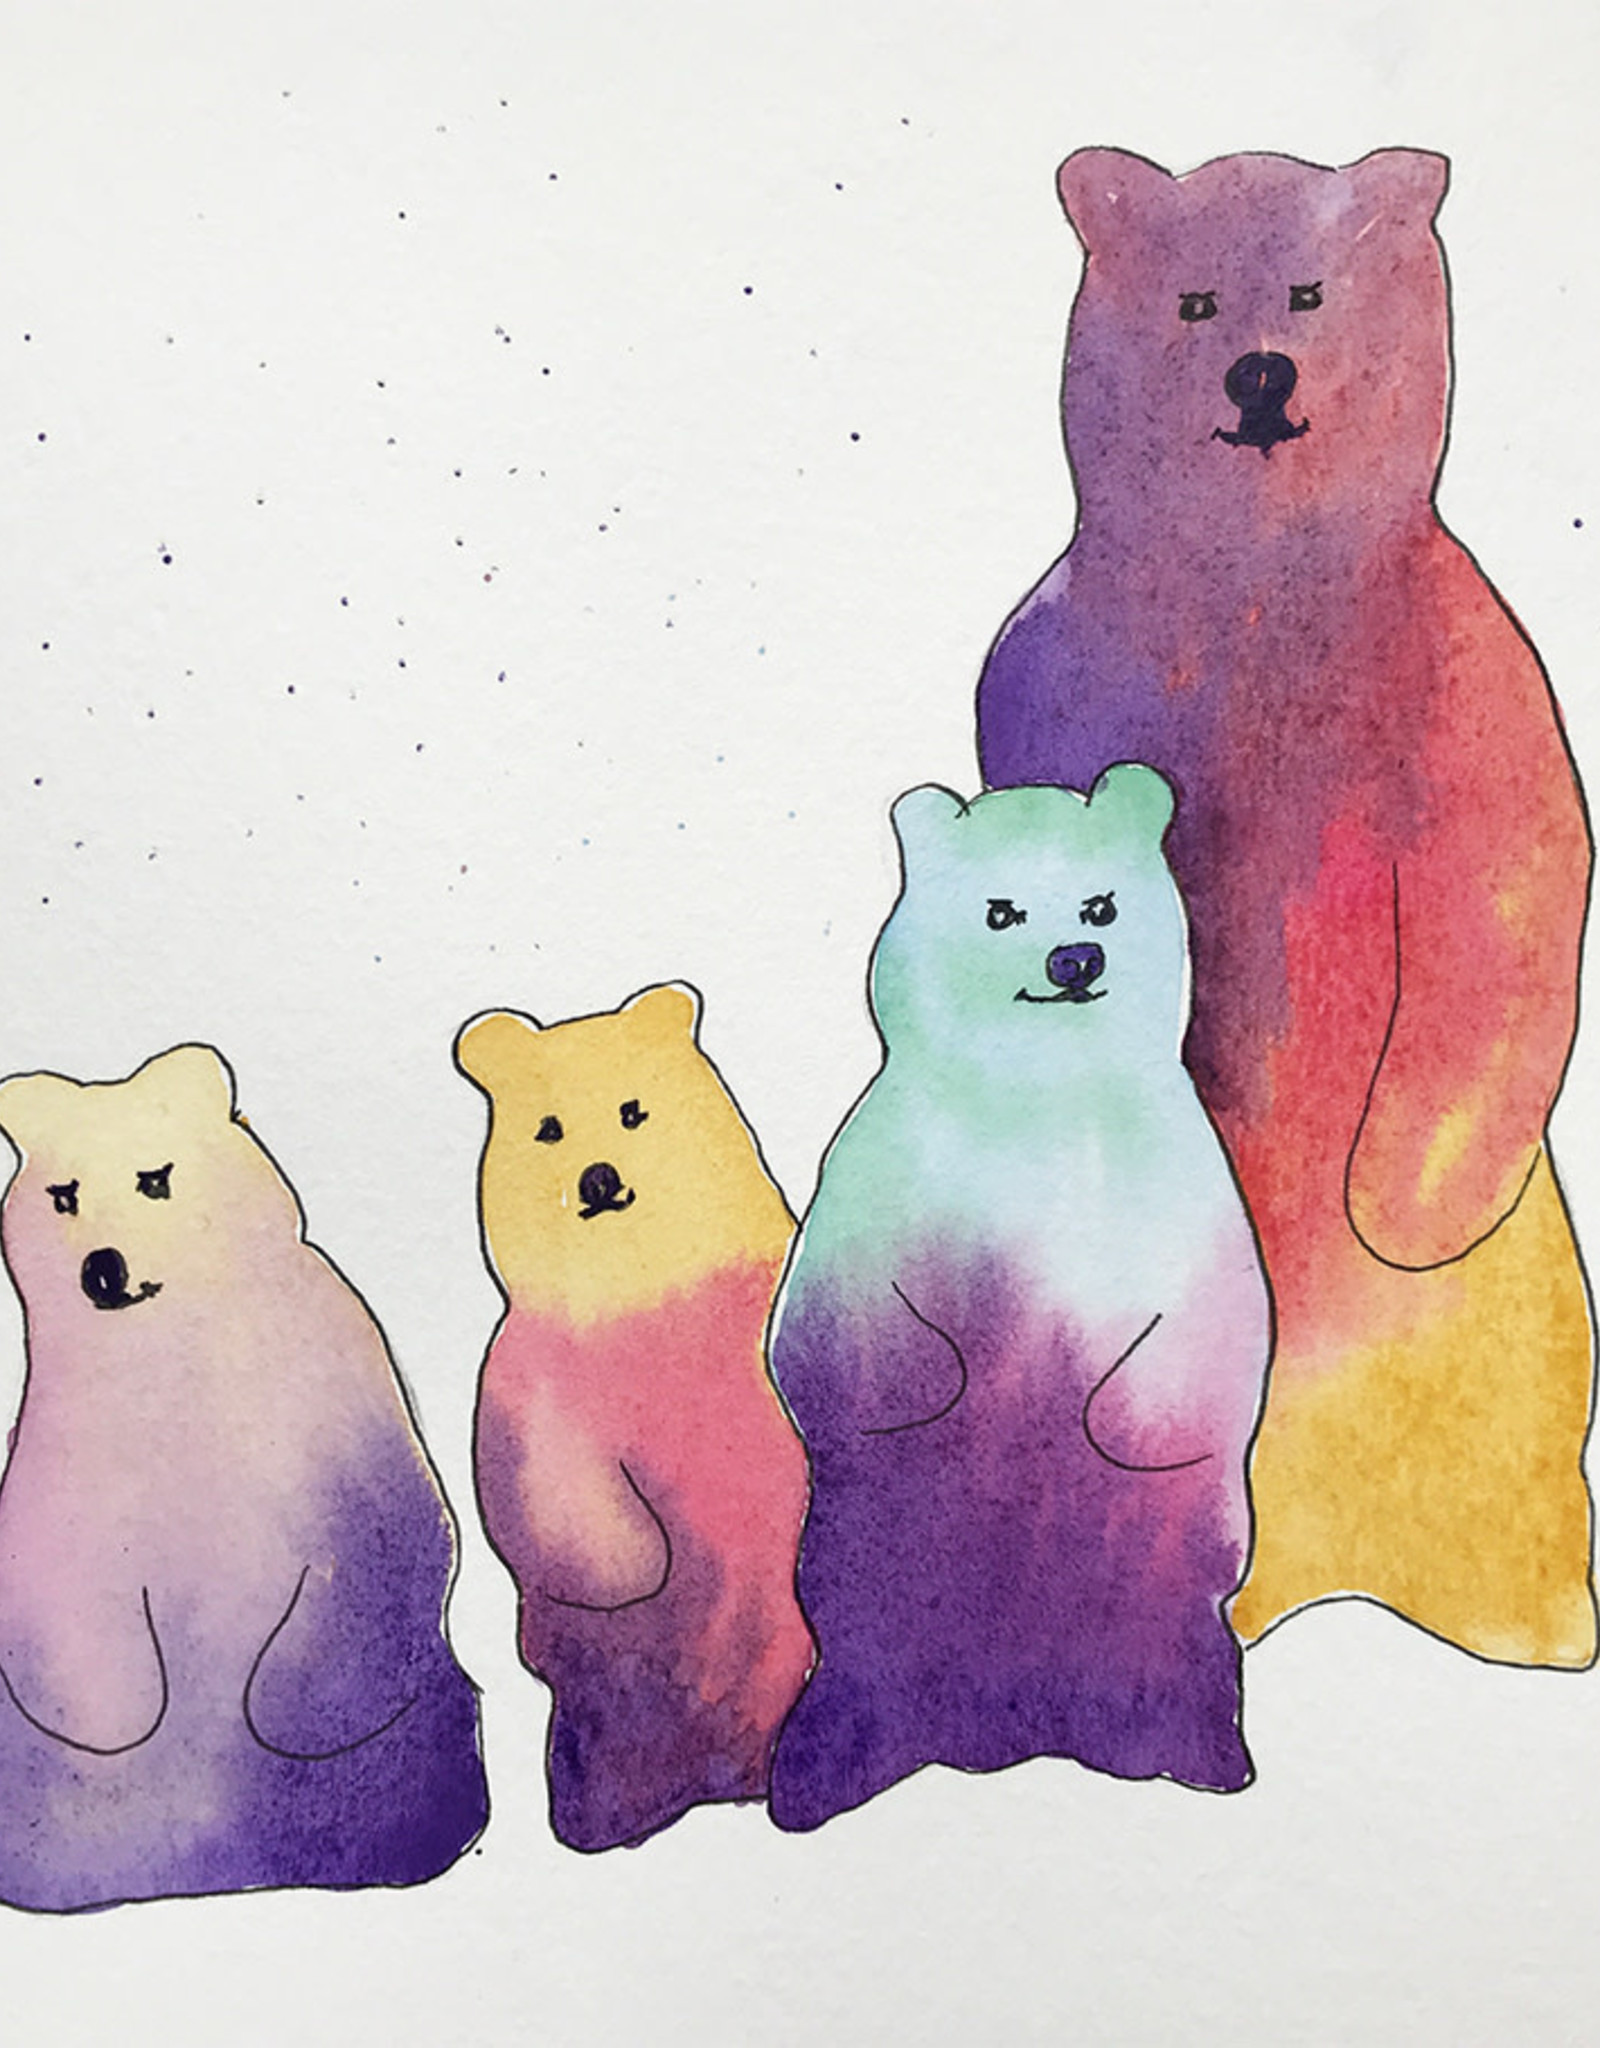 Tamara S W/C & ink Bears Sun Dec 13 11:00 am to 12:30 pm